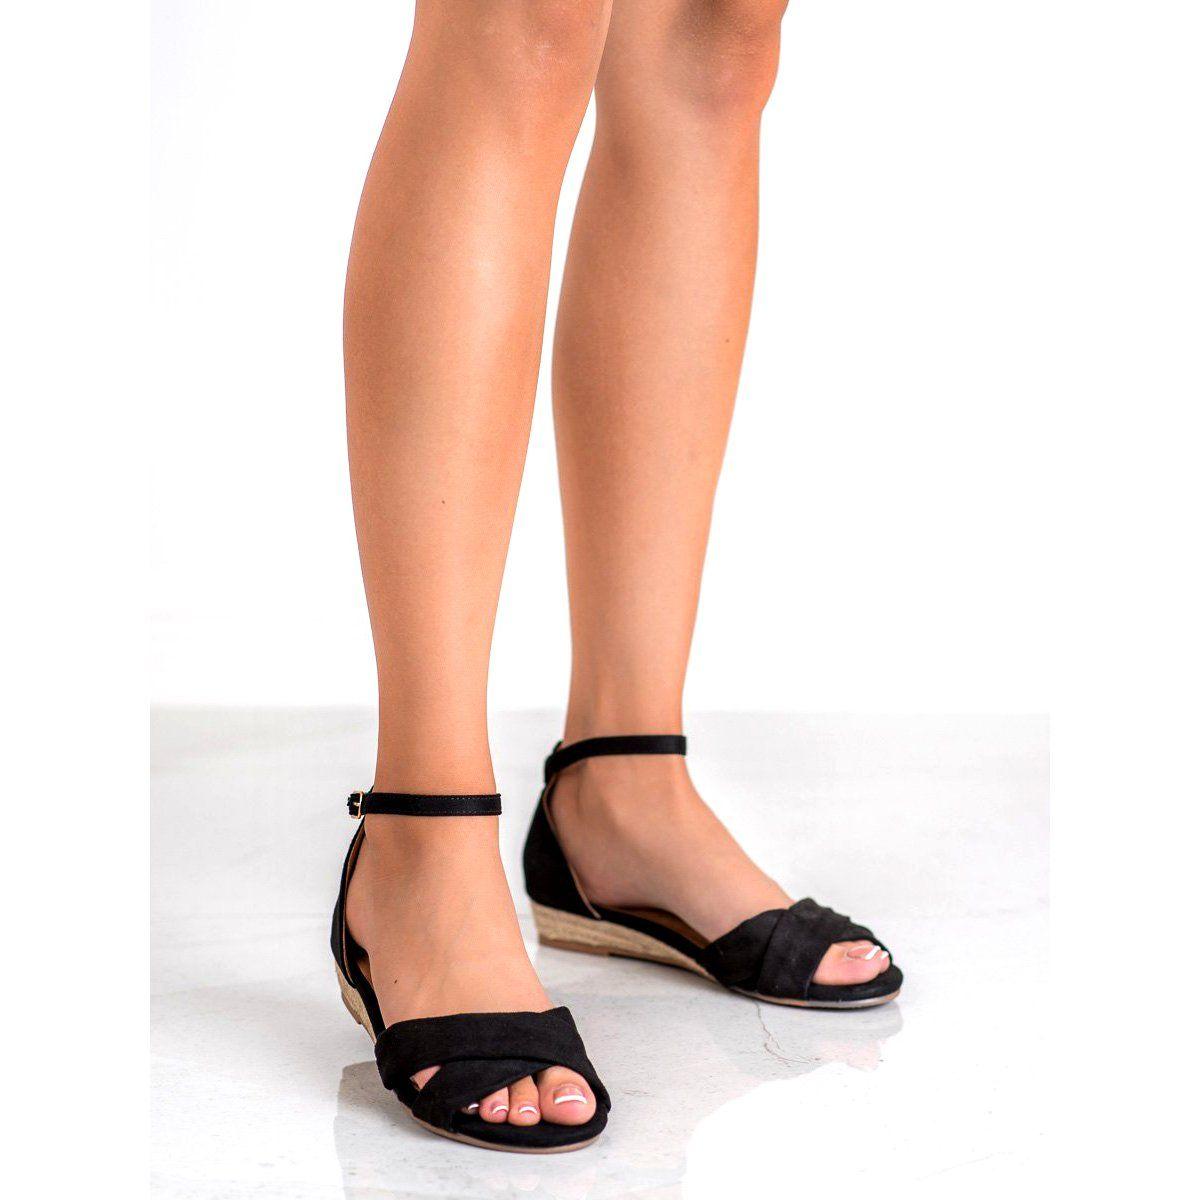 Clowse Zamszowe Sandaly Czarne Shoes Sandals Fashion